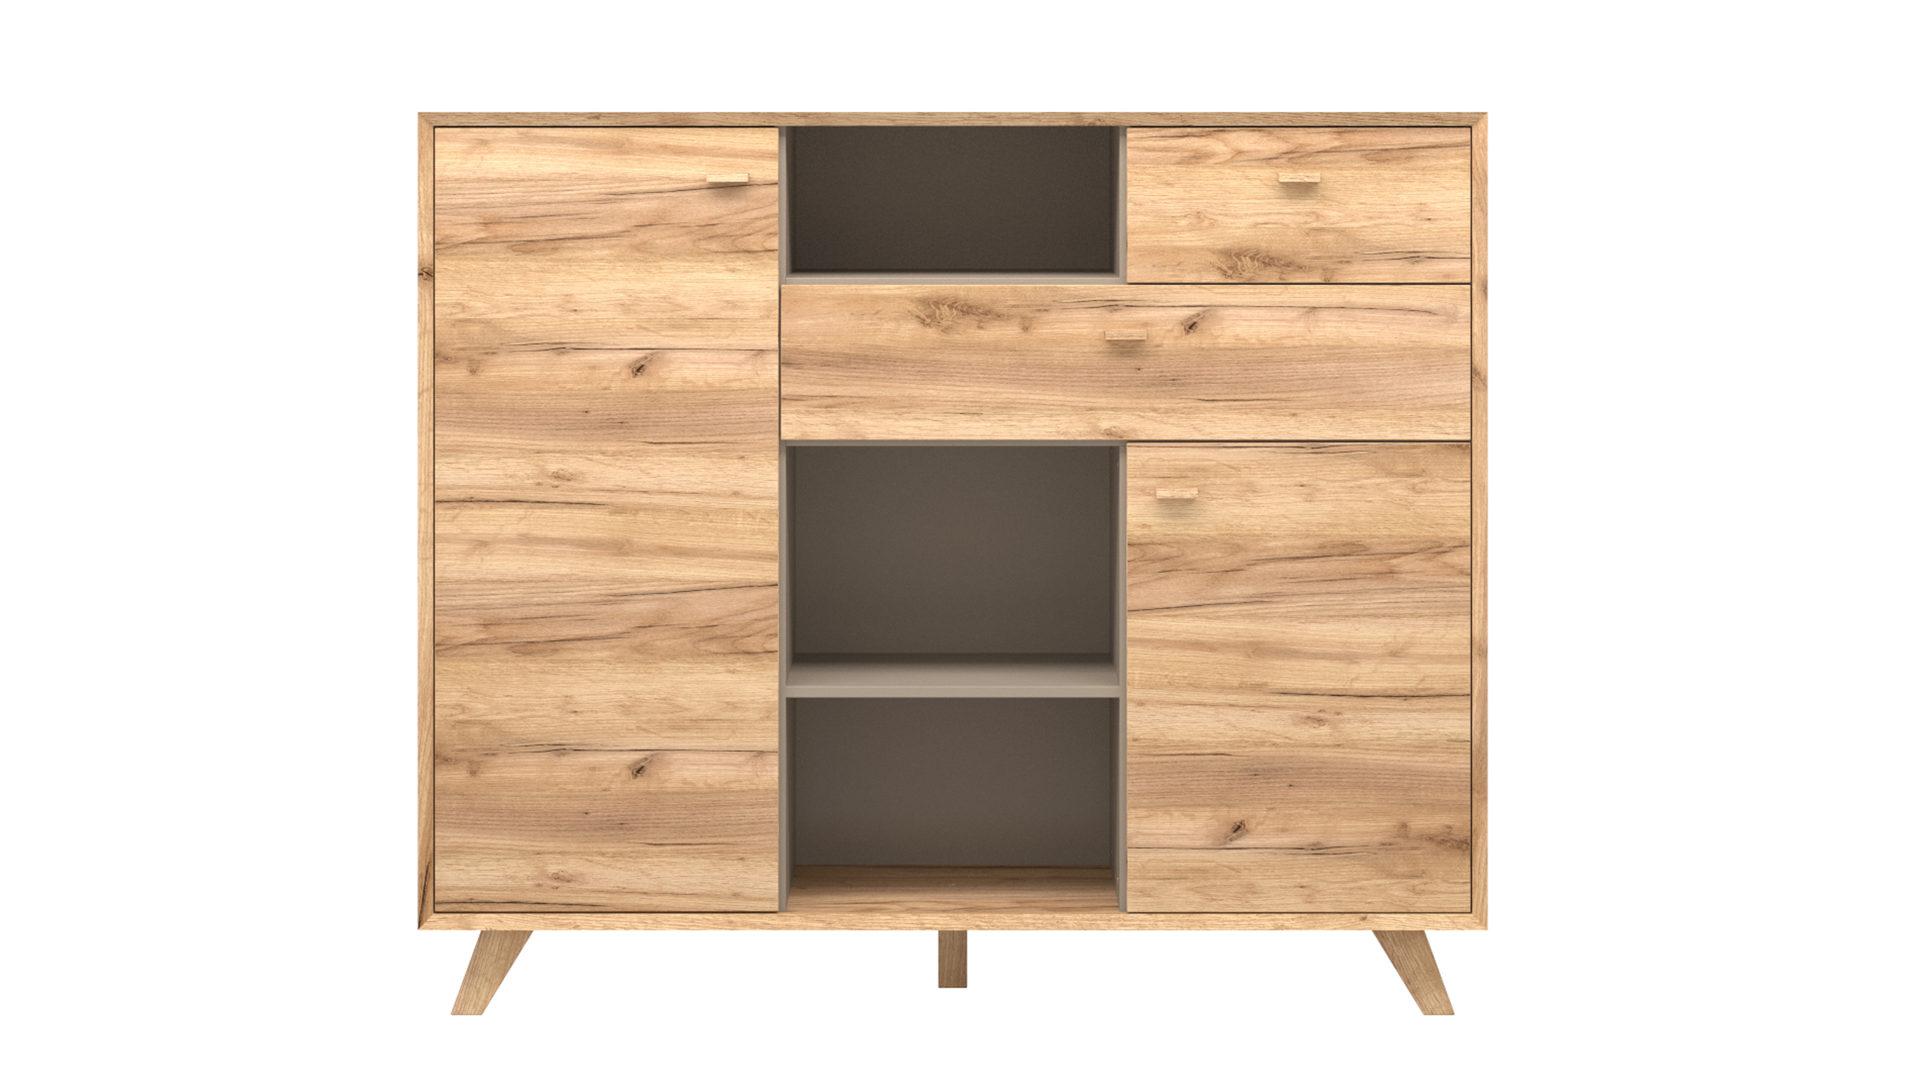 Hertel Möbel e.K. Gesees, Räume, Schlafzimmer, Kommoden + Sideboards ...